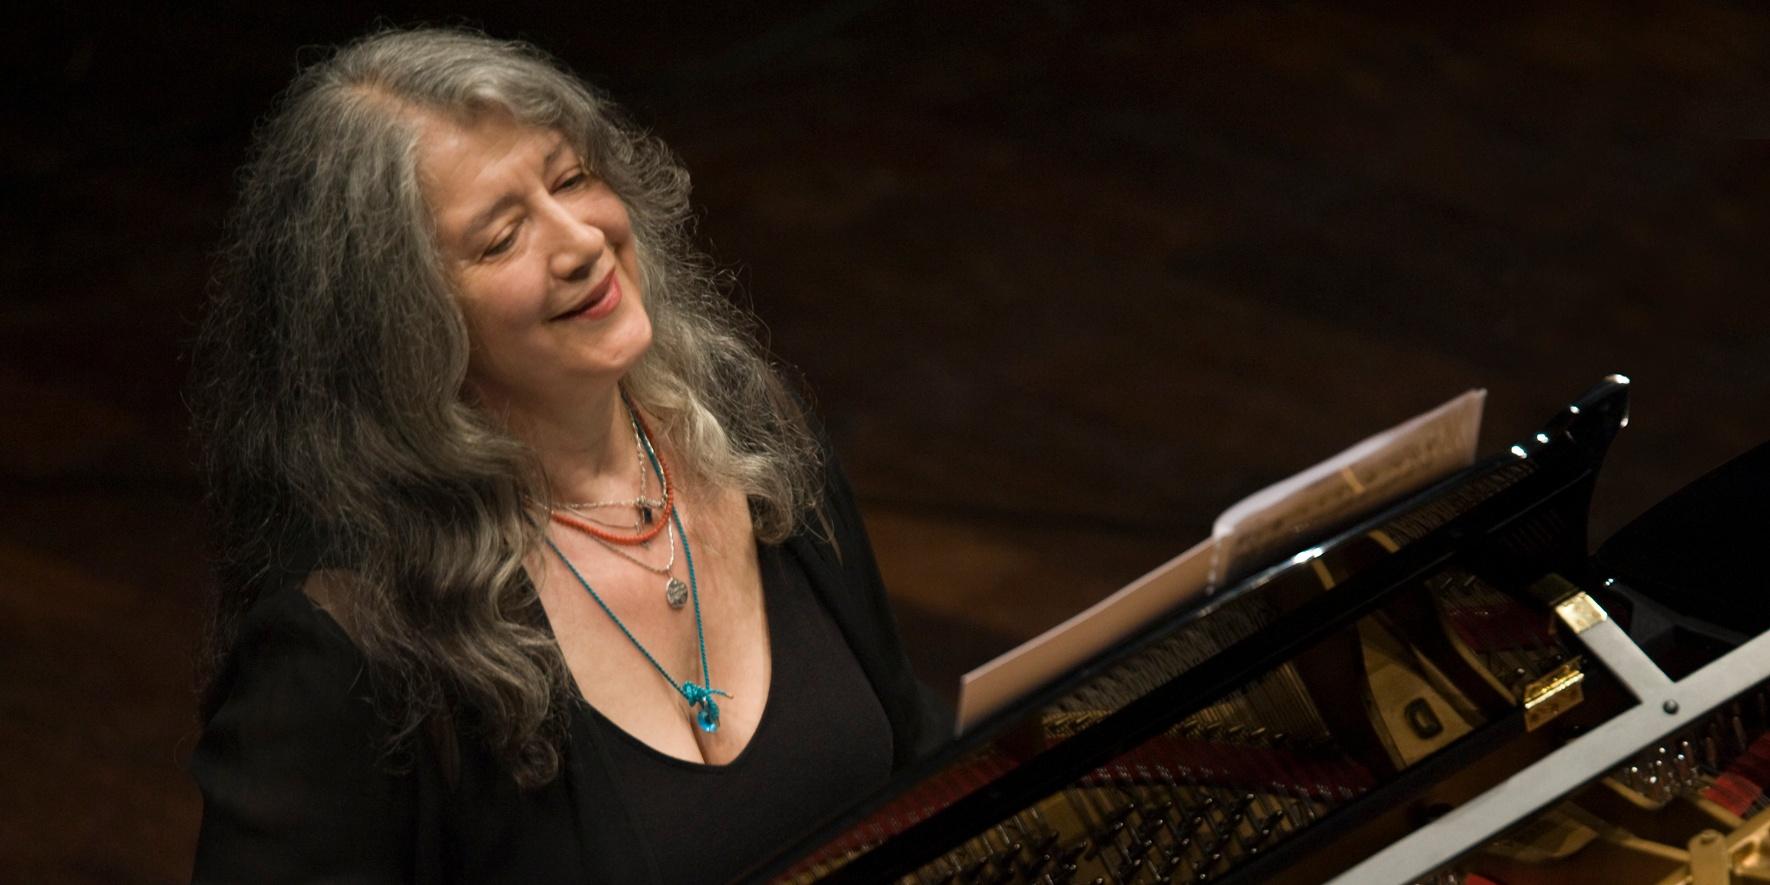 Martha Argerich postpones Singapore concerts due to health concerns